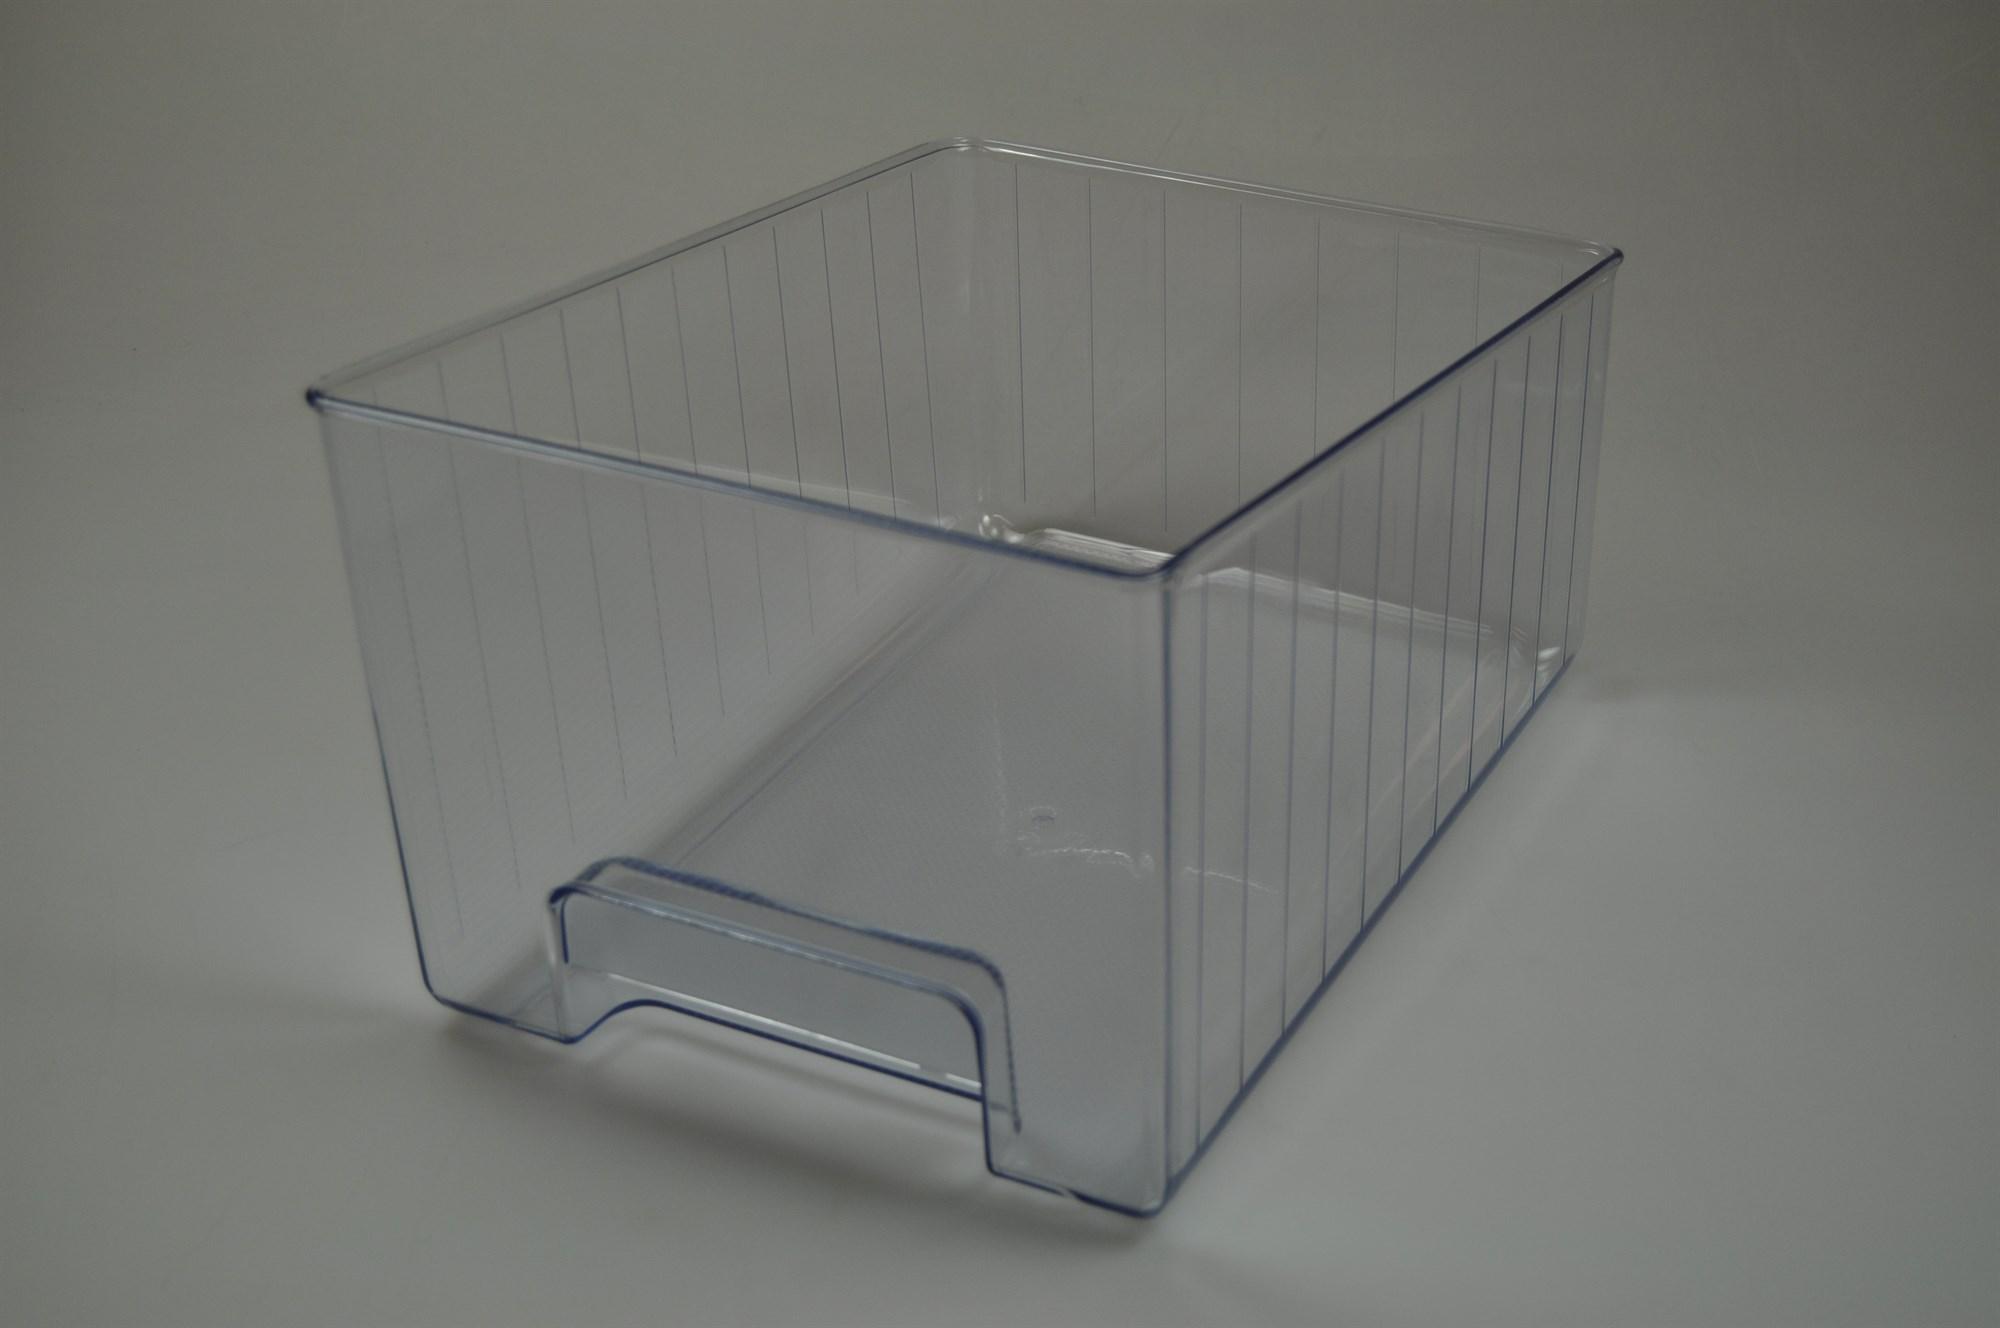 bac l gume bosch frigo cong lateur 185mm x 220mm x 310mm. Black Bedroom Furniture Sets. Home Design Ideas